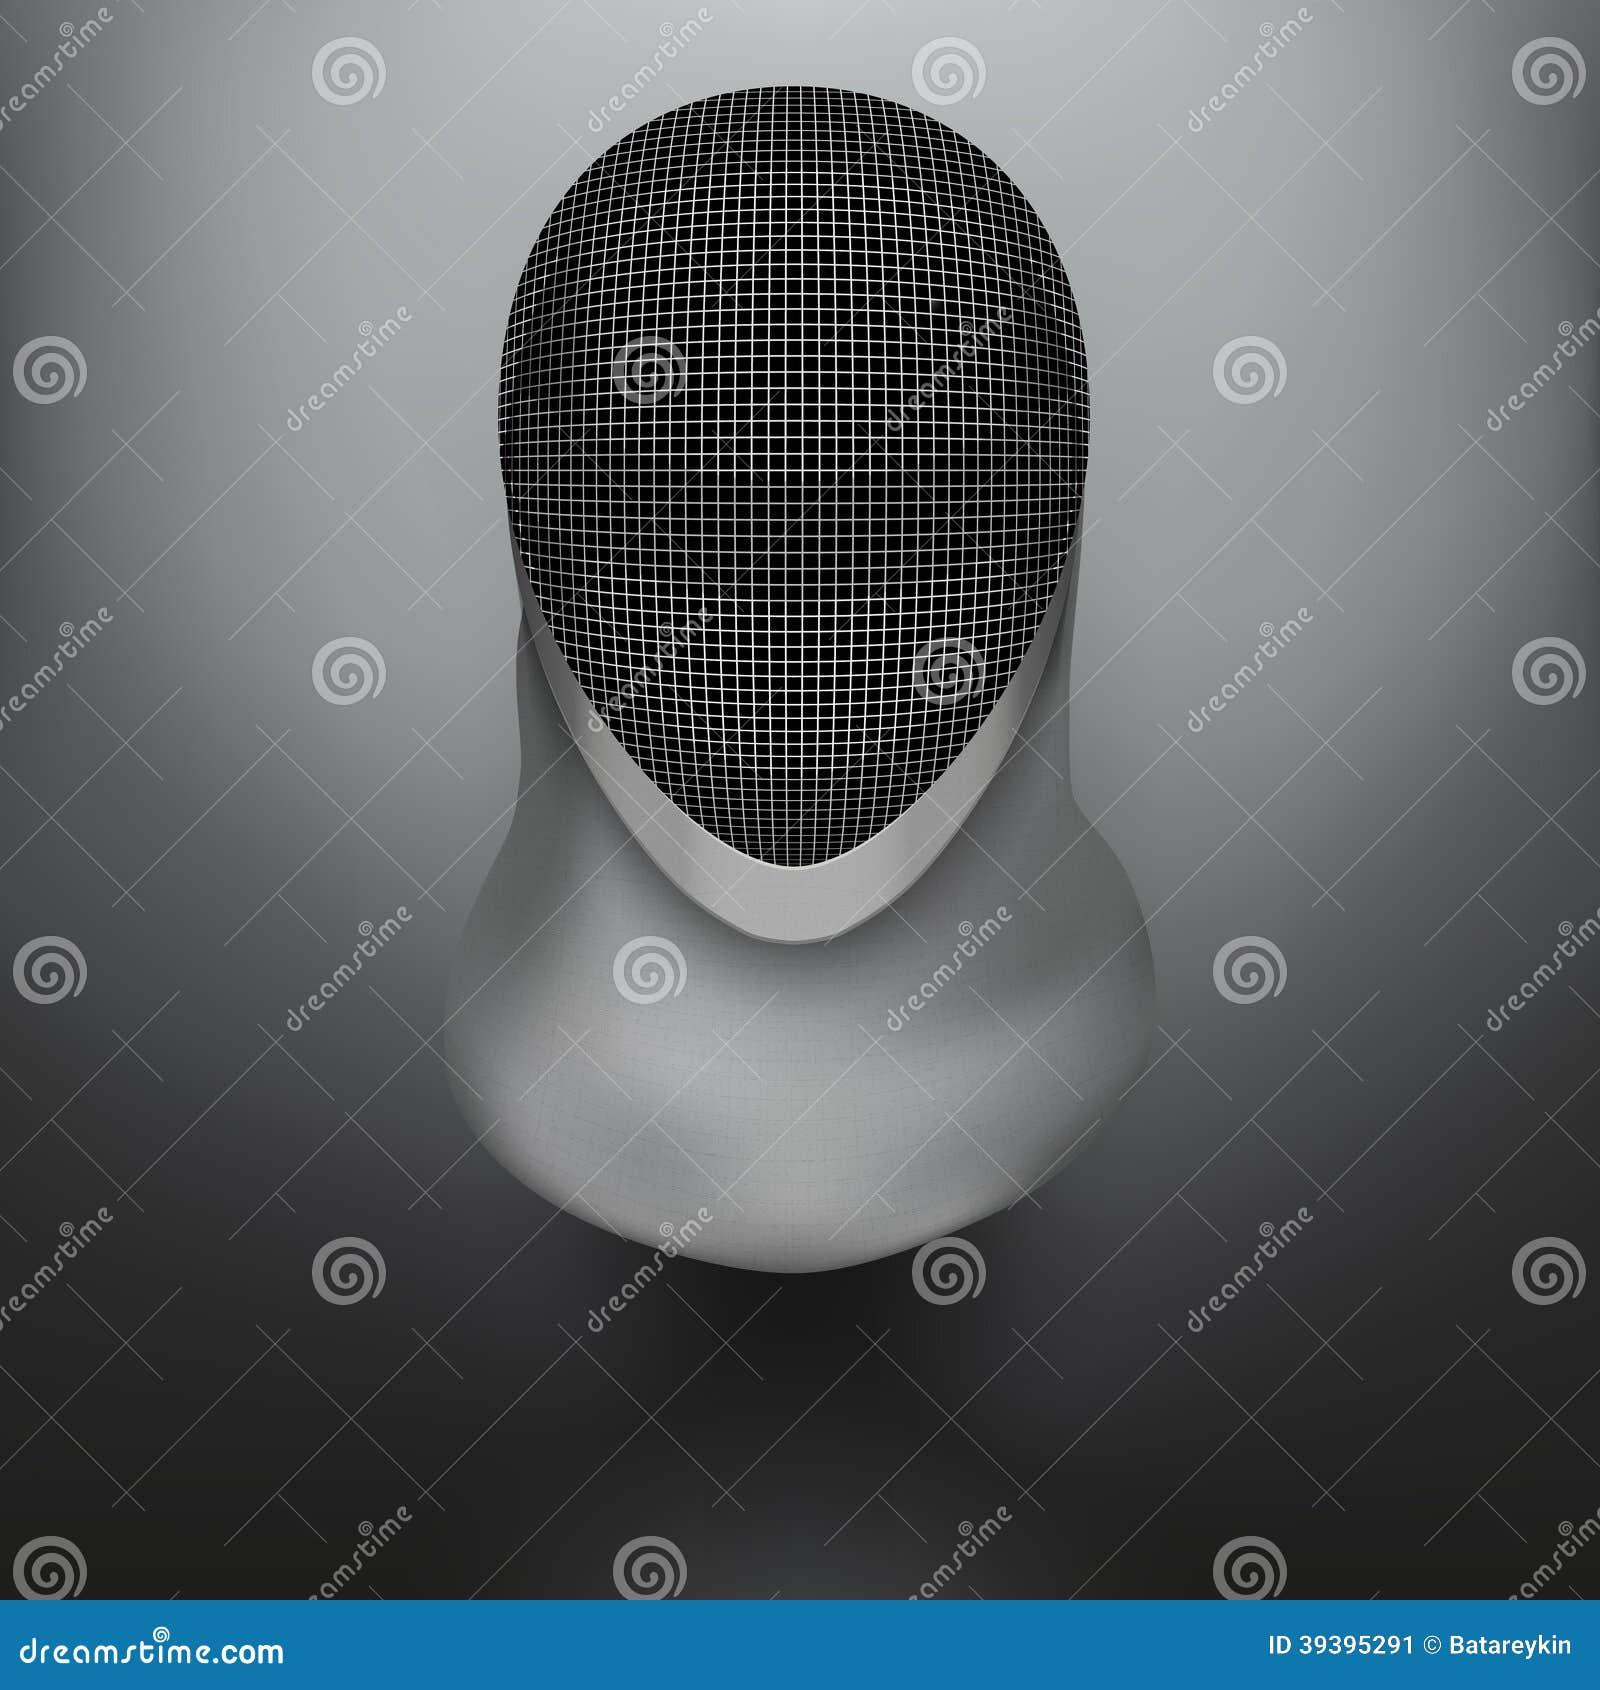 Fencing Mask Vector Background Illustration Stock Vector ...